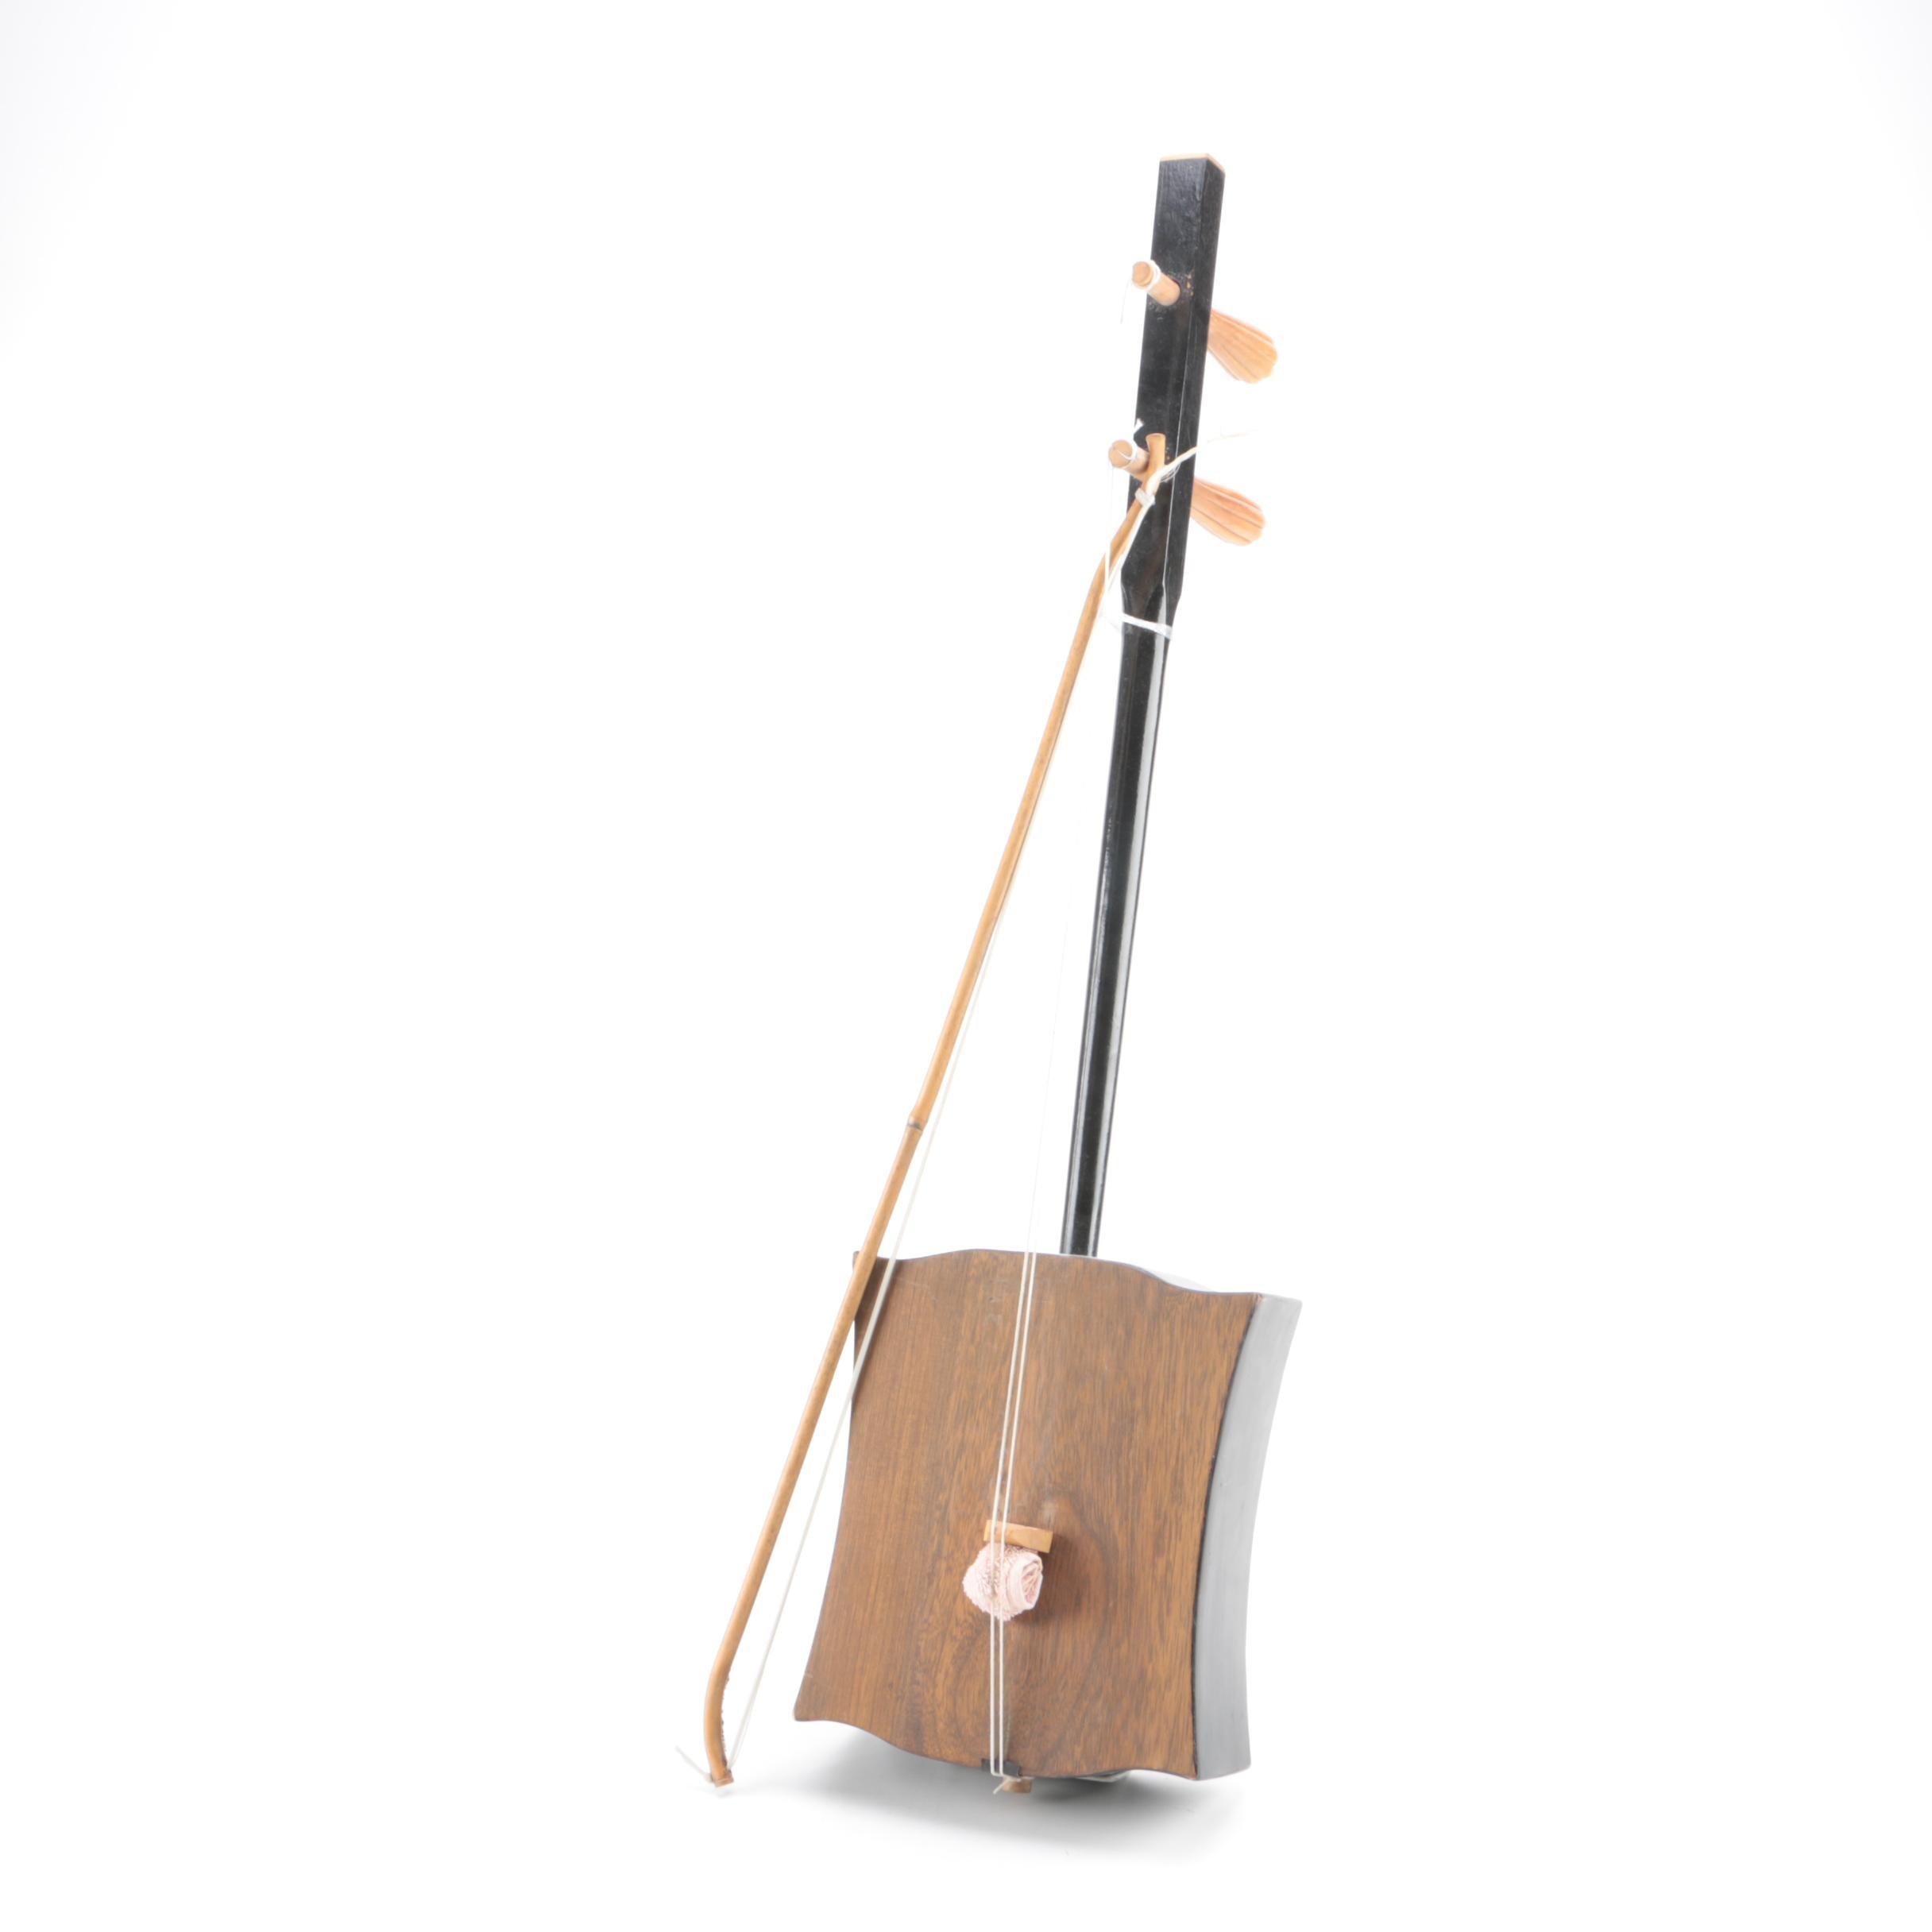 Prototype Mongolian Morin Khurr with Bow